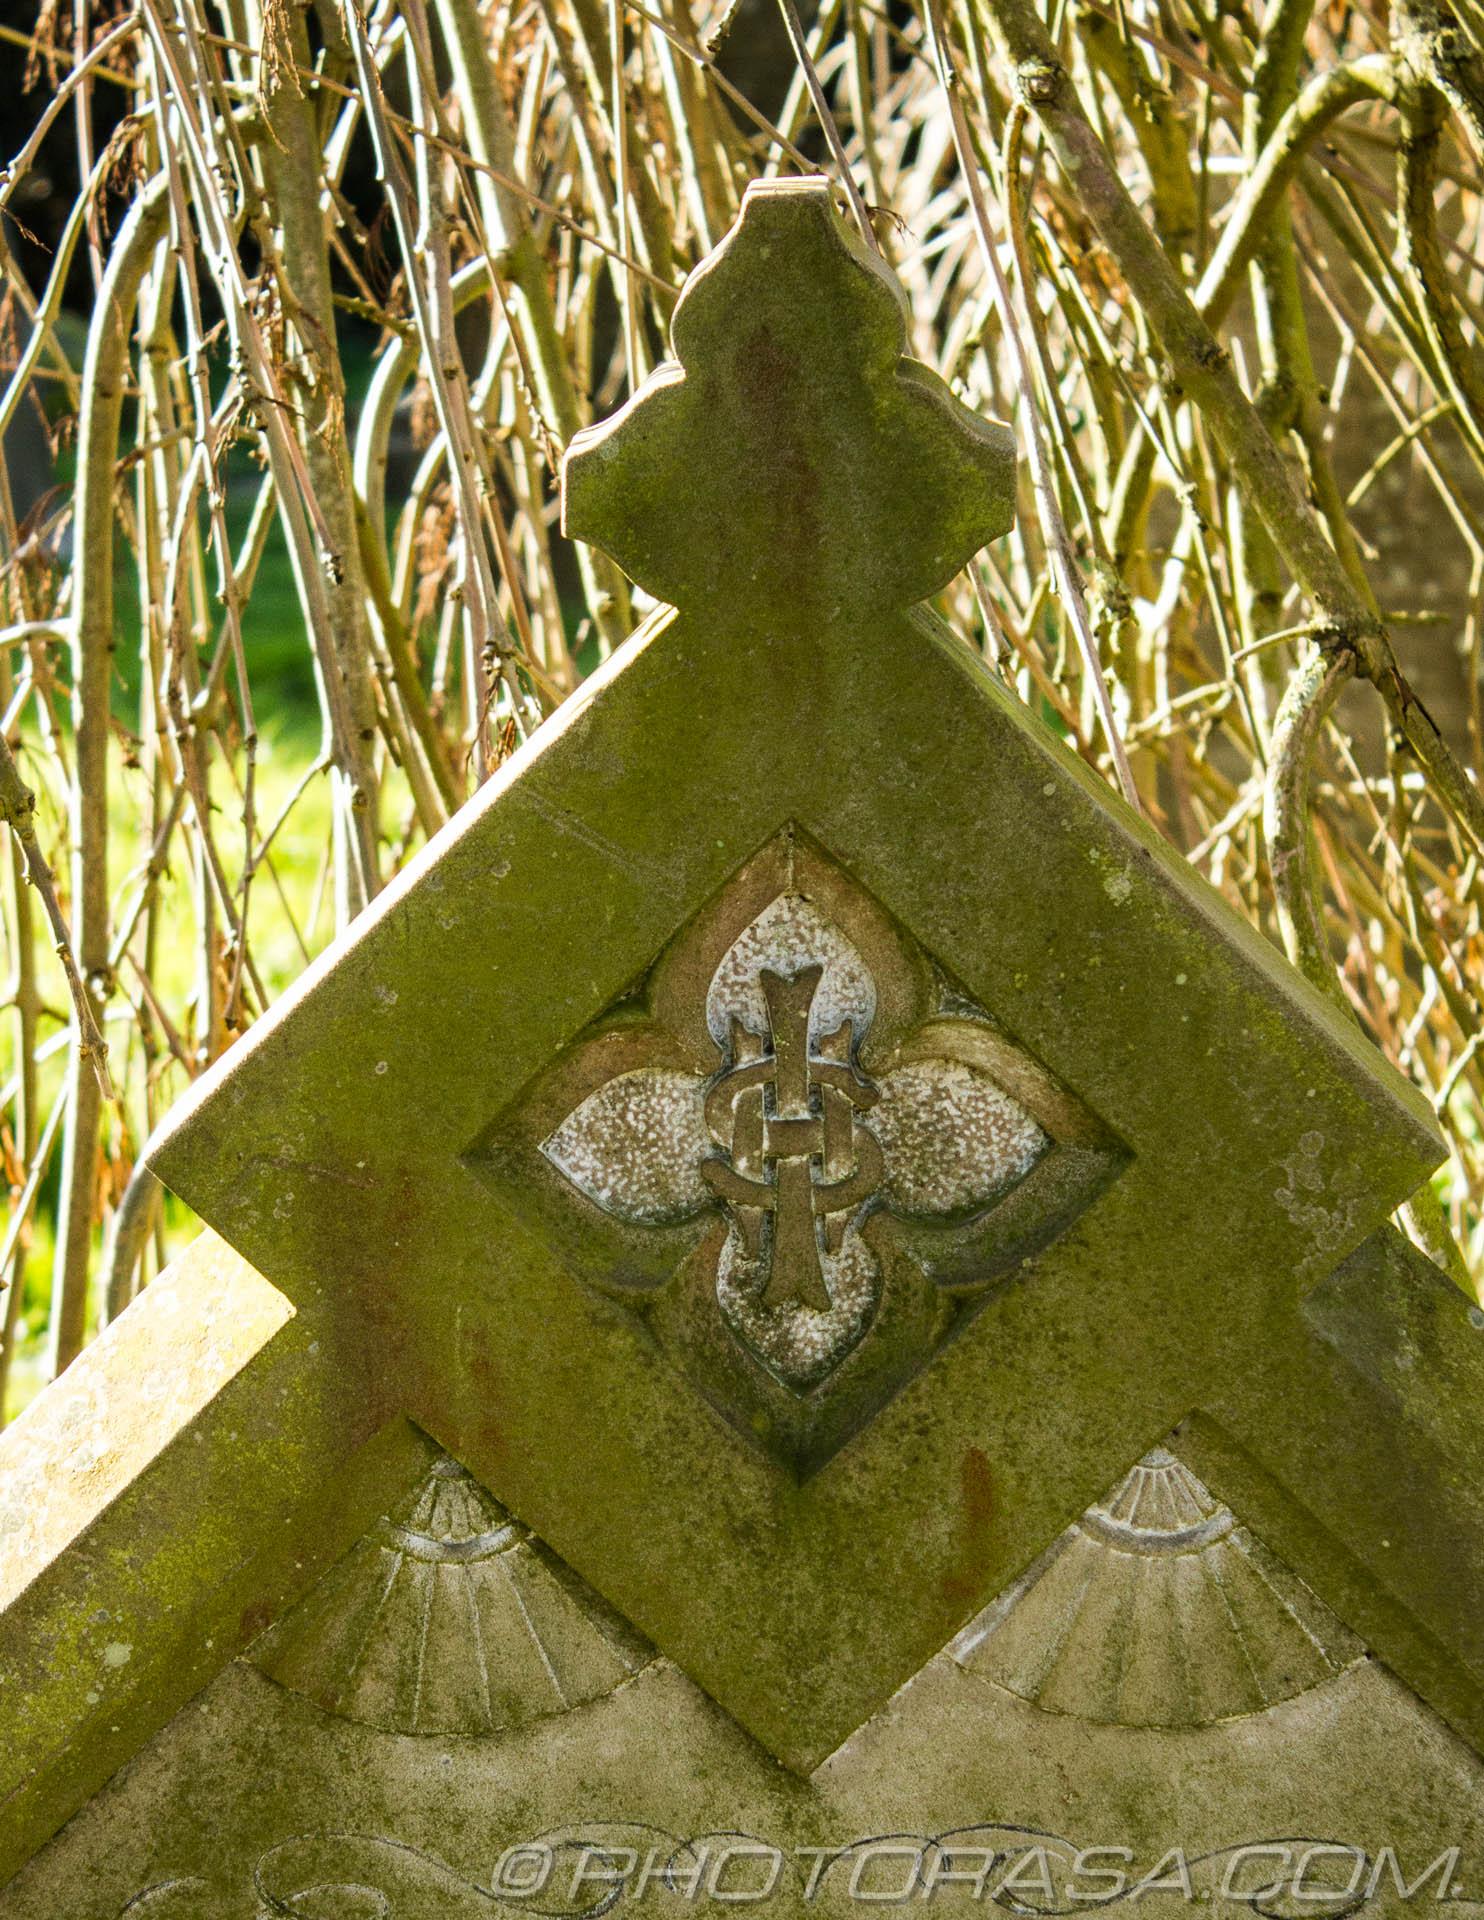 http://photorasa.com/parish-church-st-peter-st-paul-headcorn/ihs-christogram-on-grave/